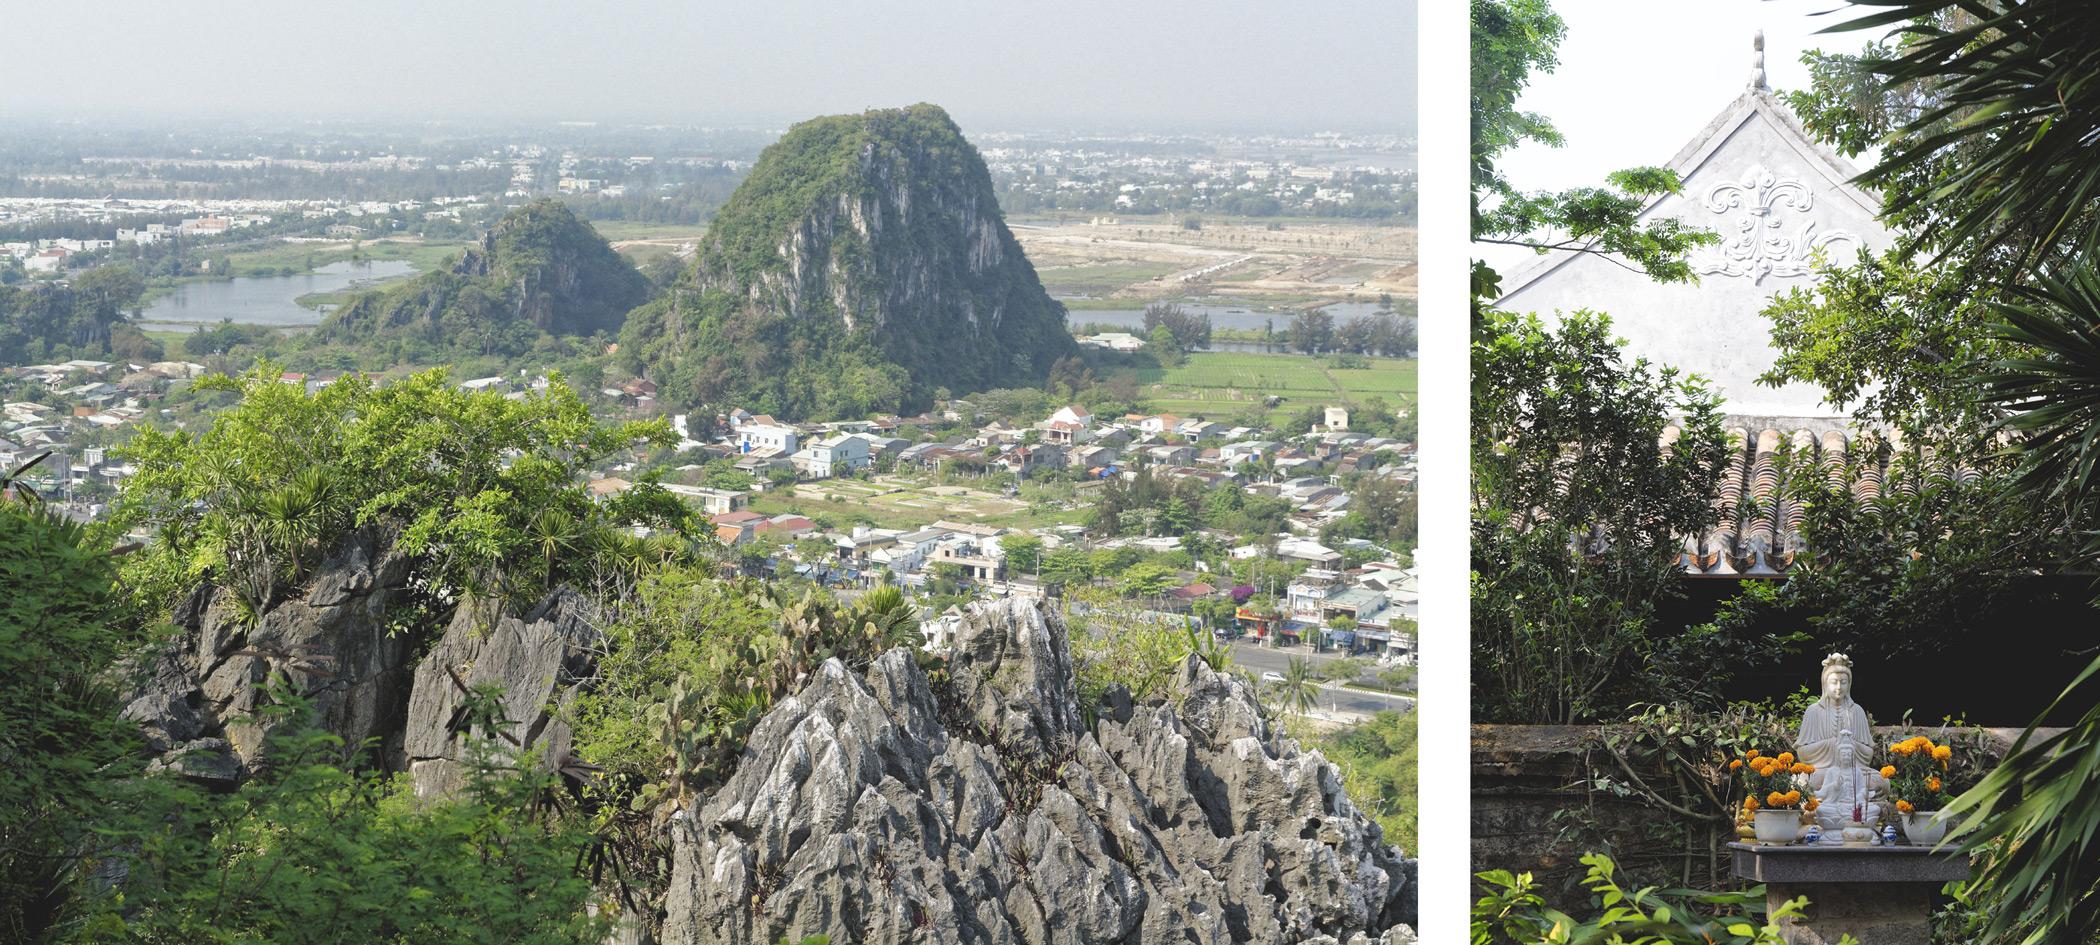 Marble mountains Danang